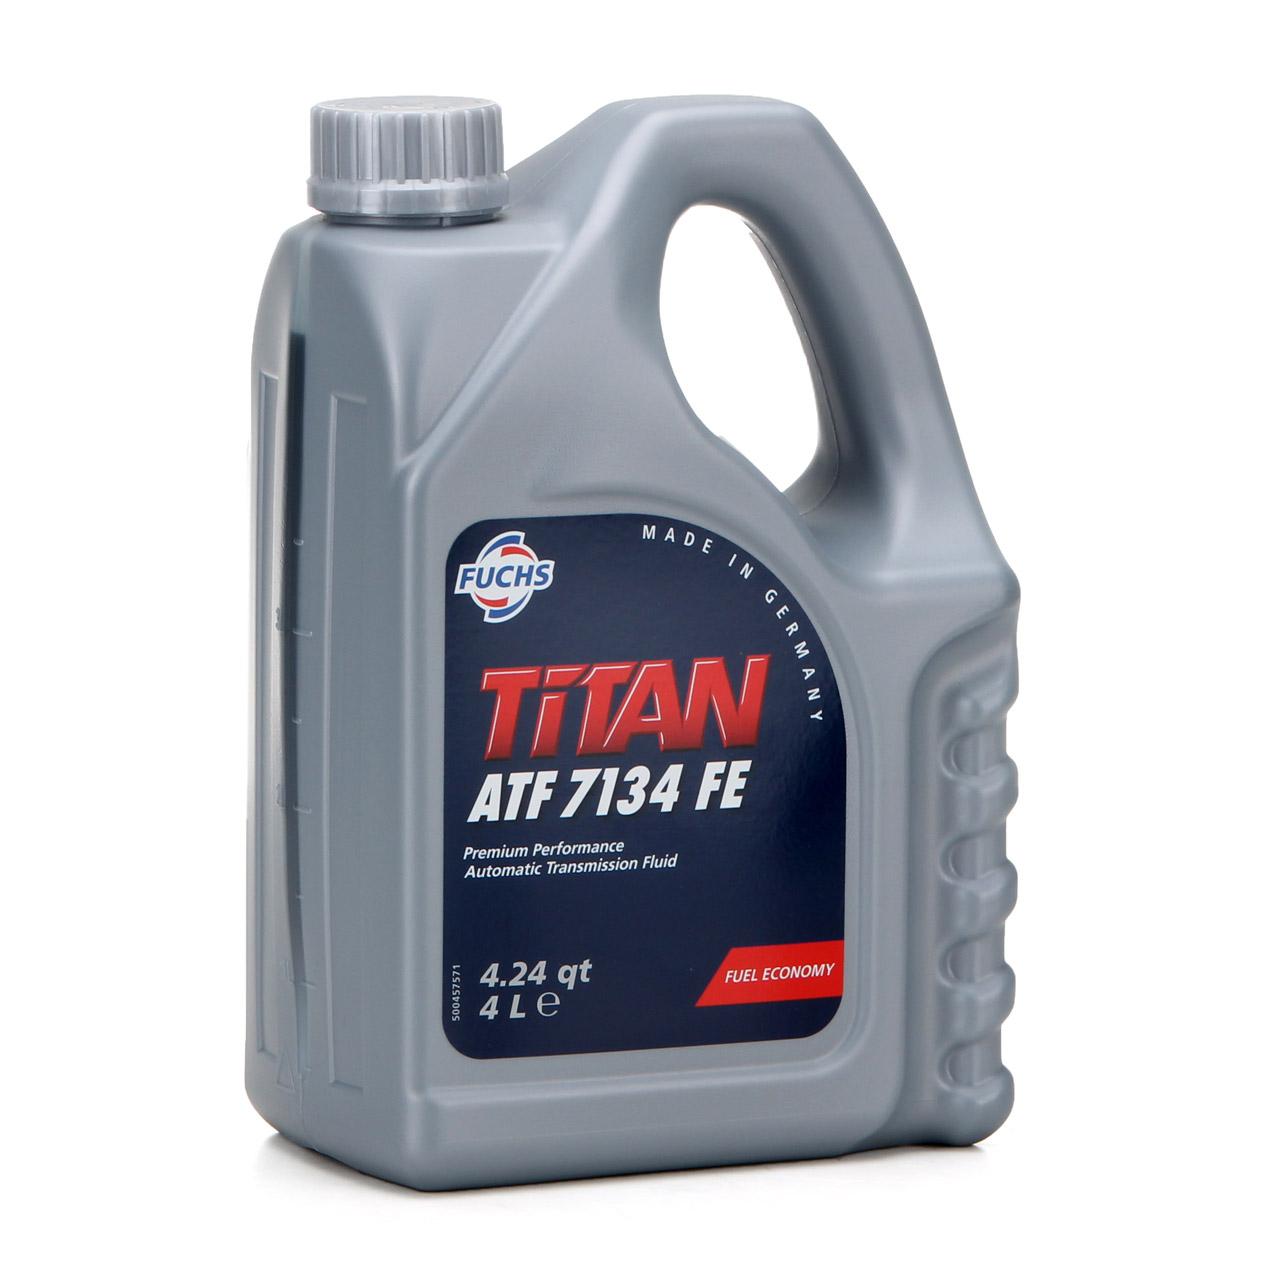 FUCHS Getriebeöl Automatikgetriebeöl TITAN ATF 7134 FE 4L 4 Liter MB 236.15